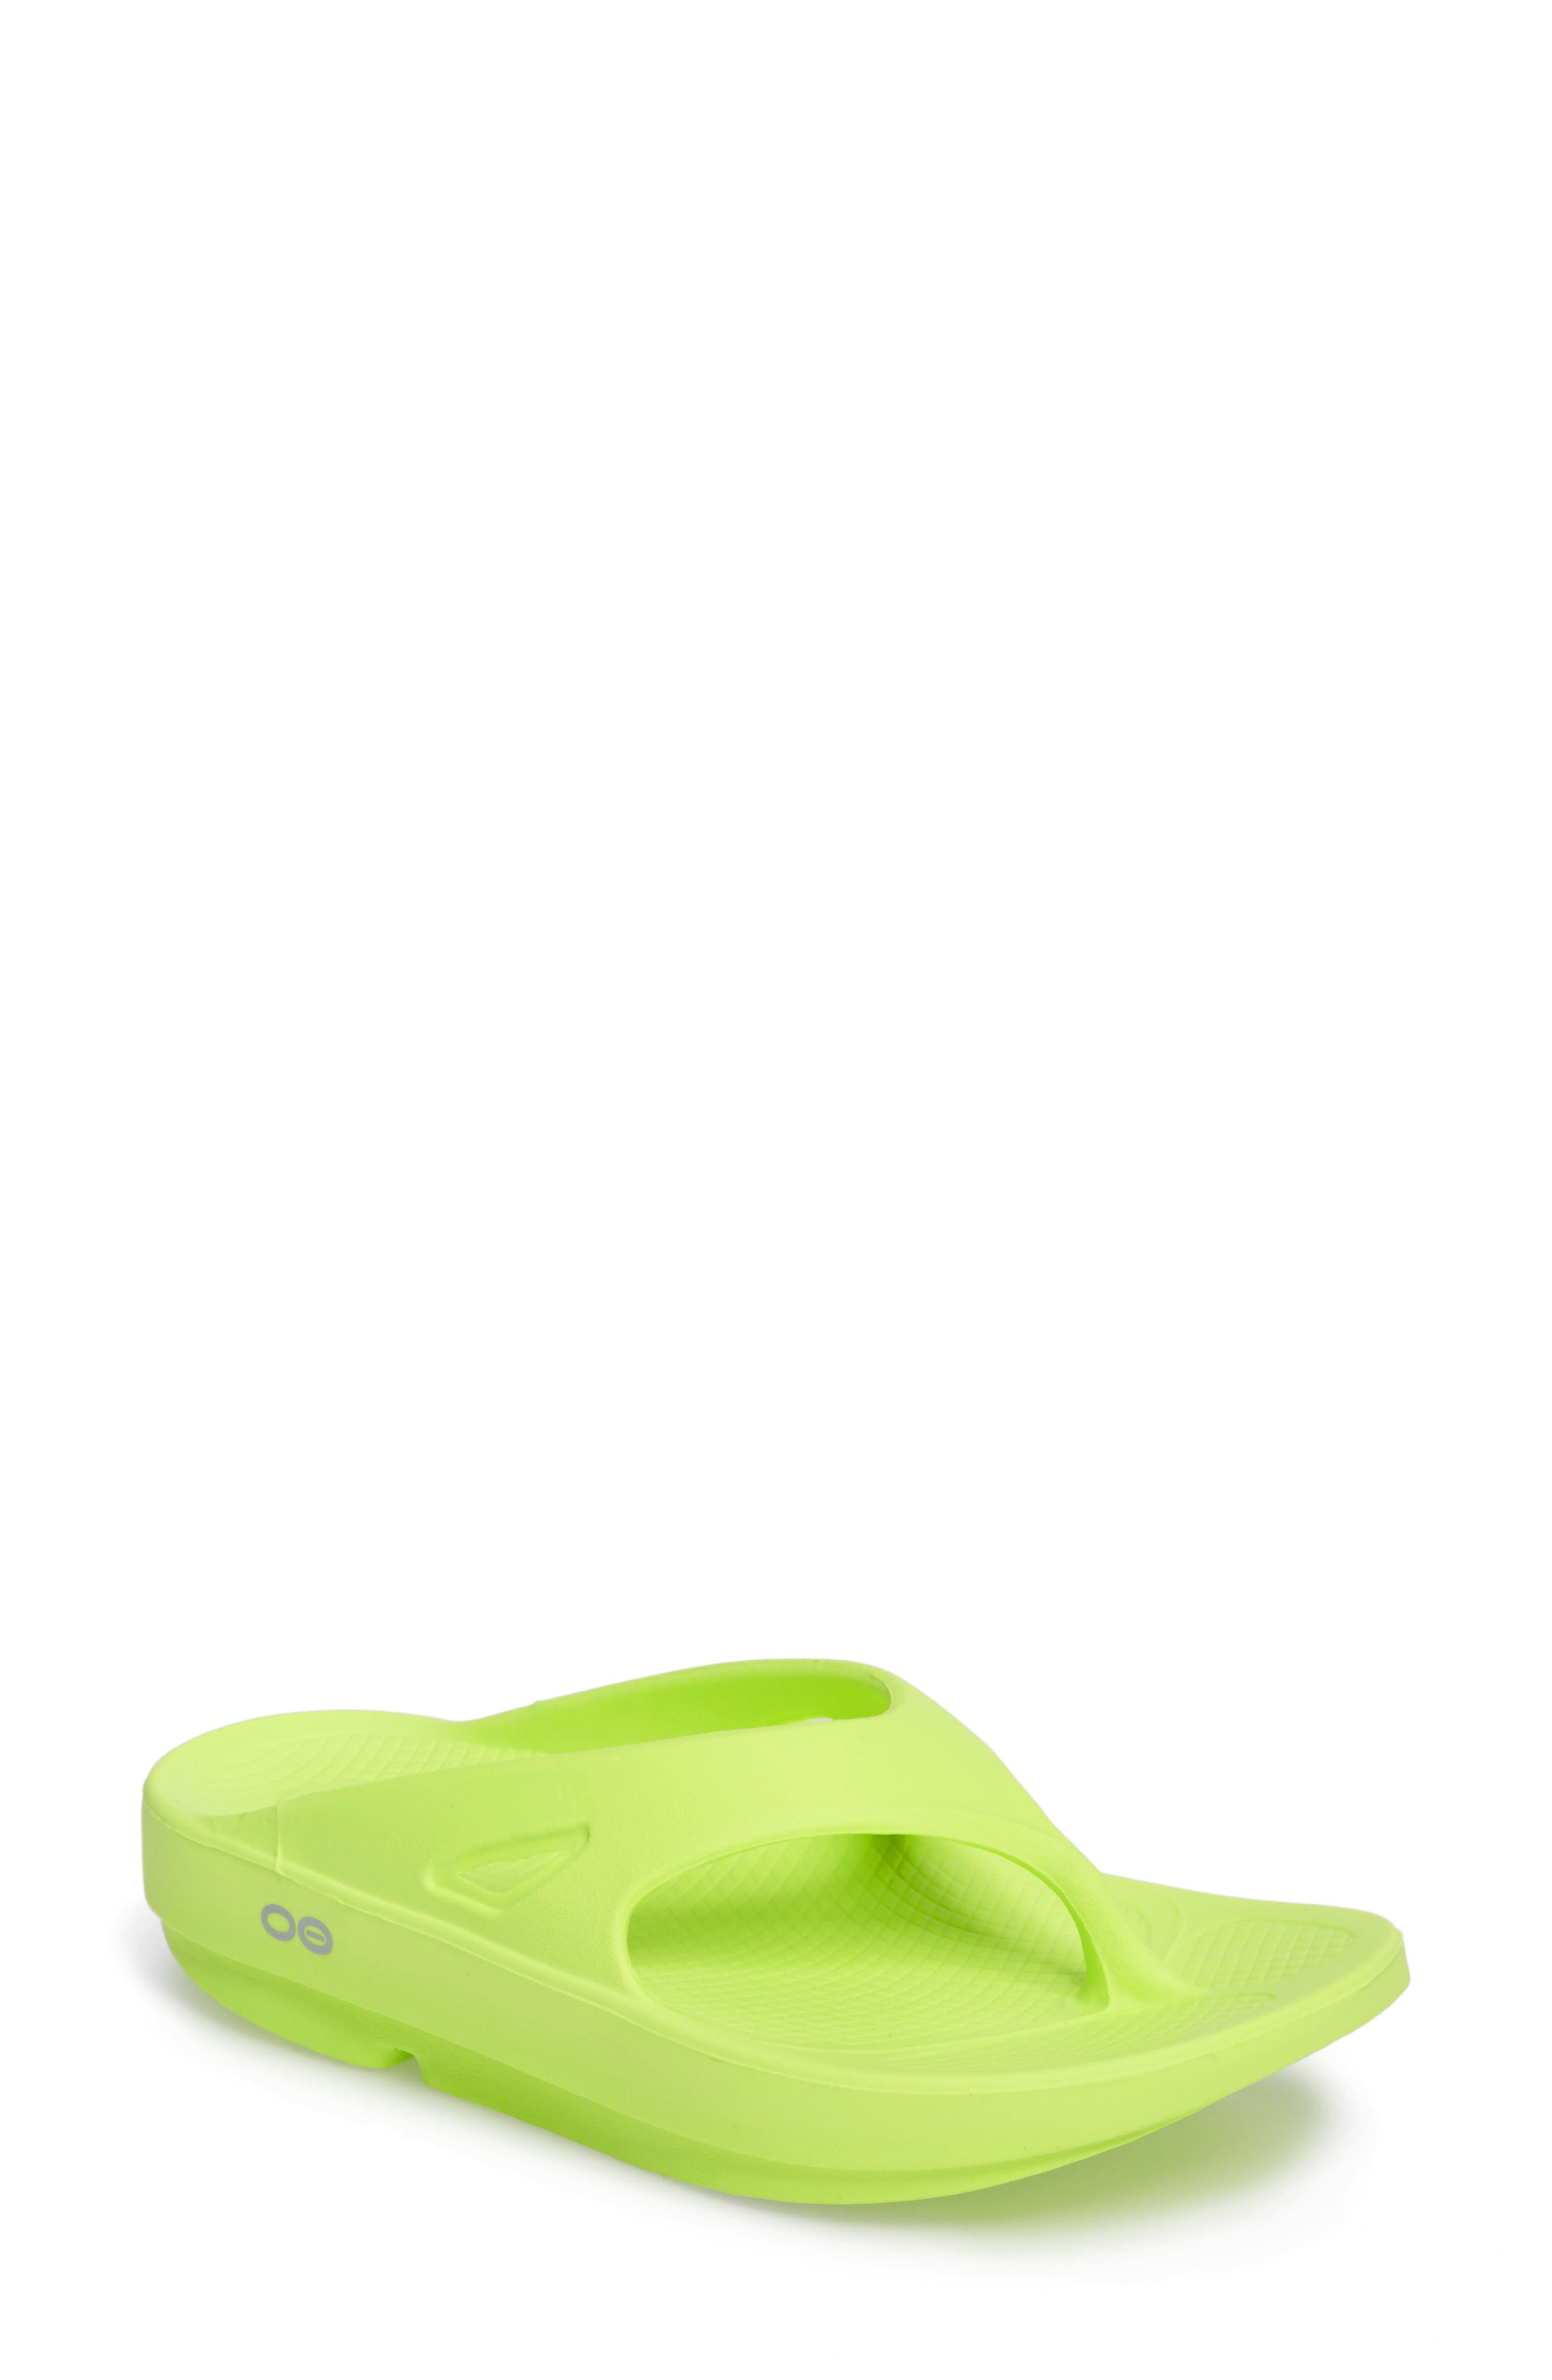 OOriginal Sandal,                         Main,                         color, Citron